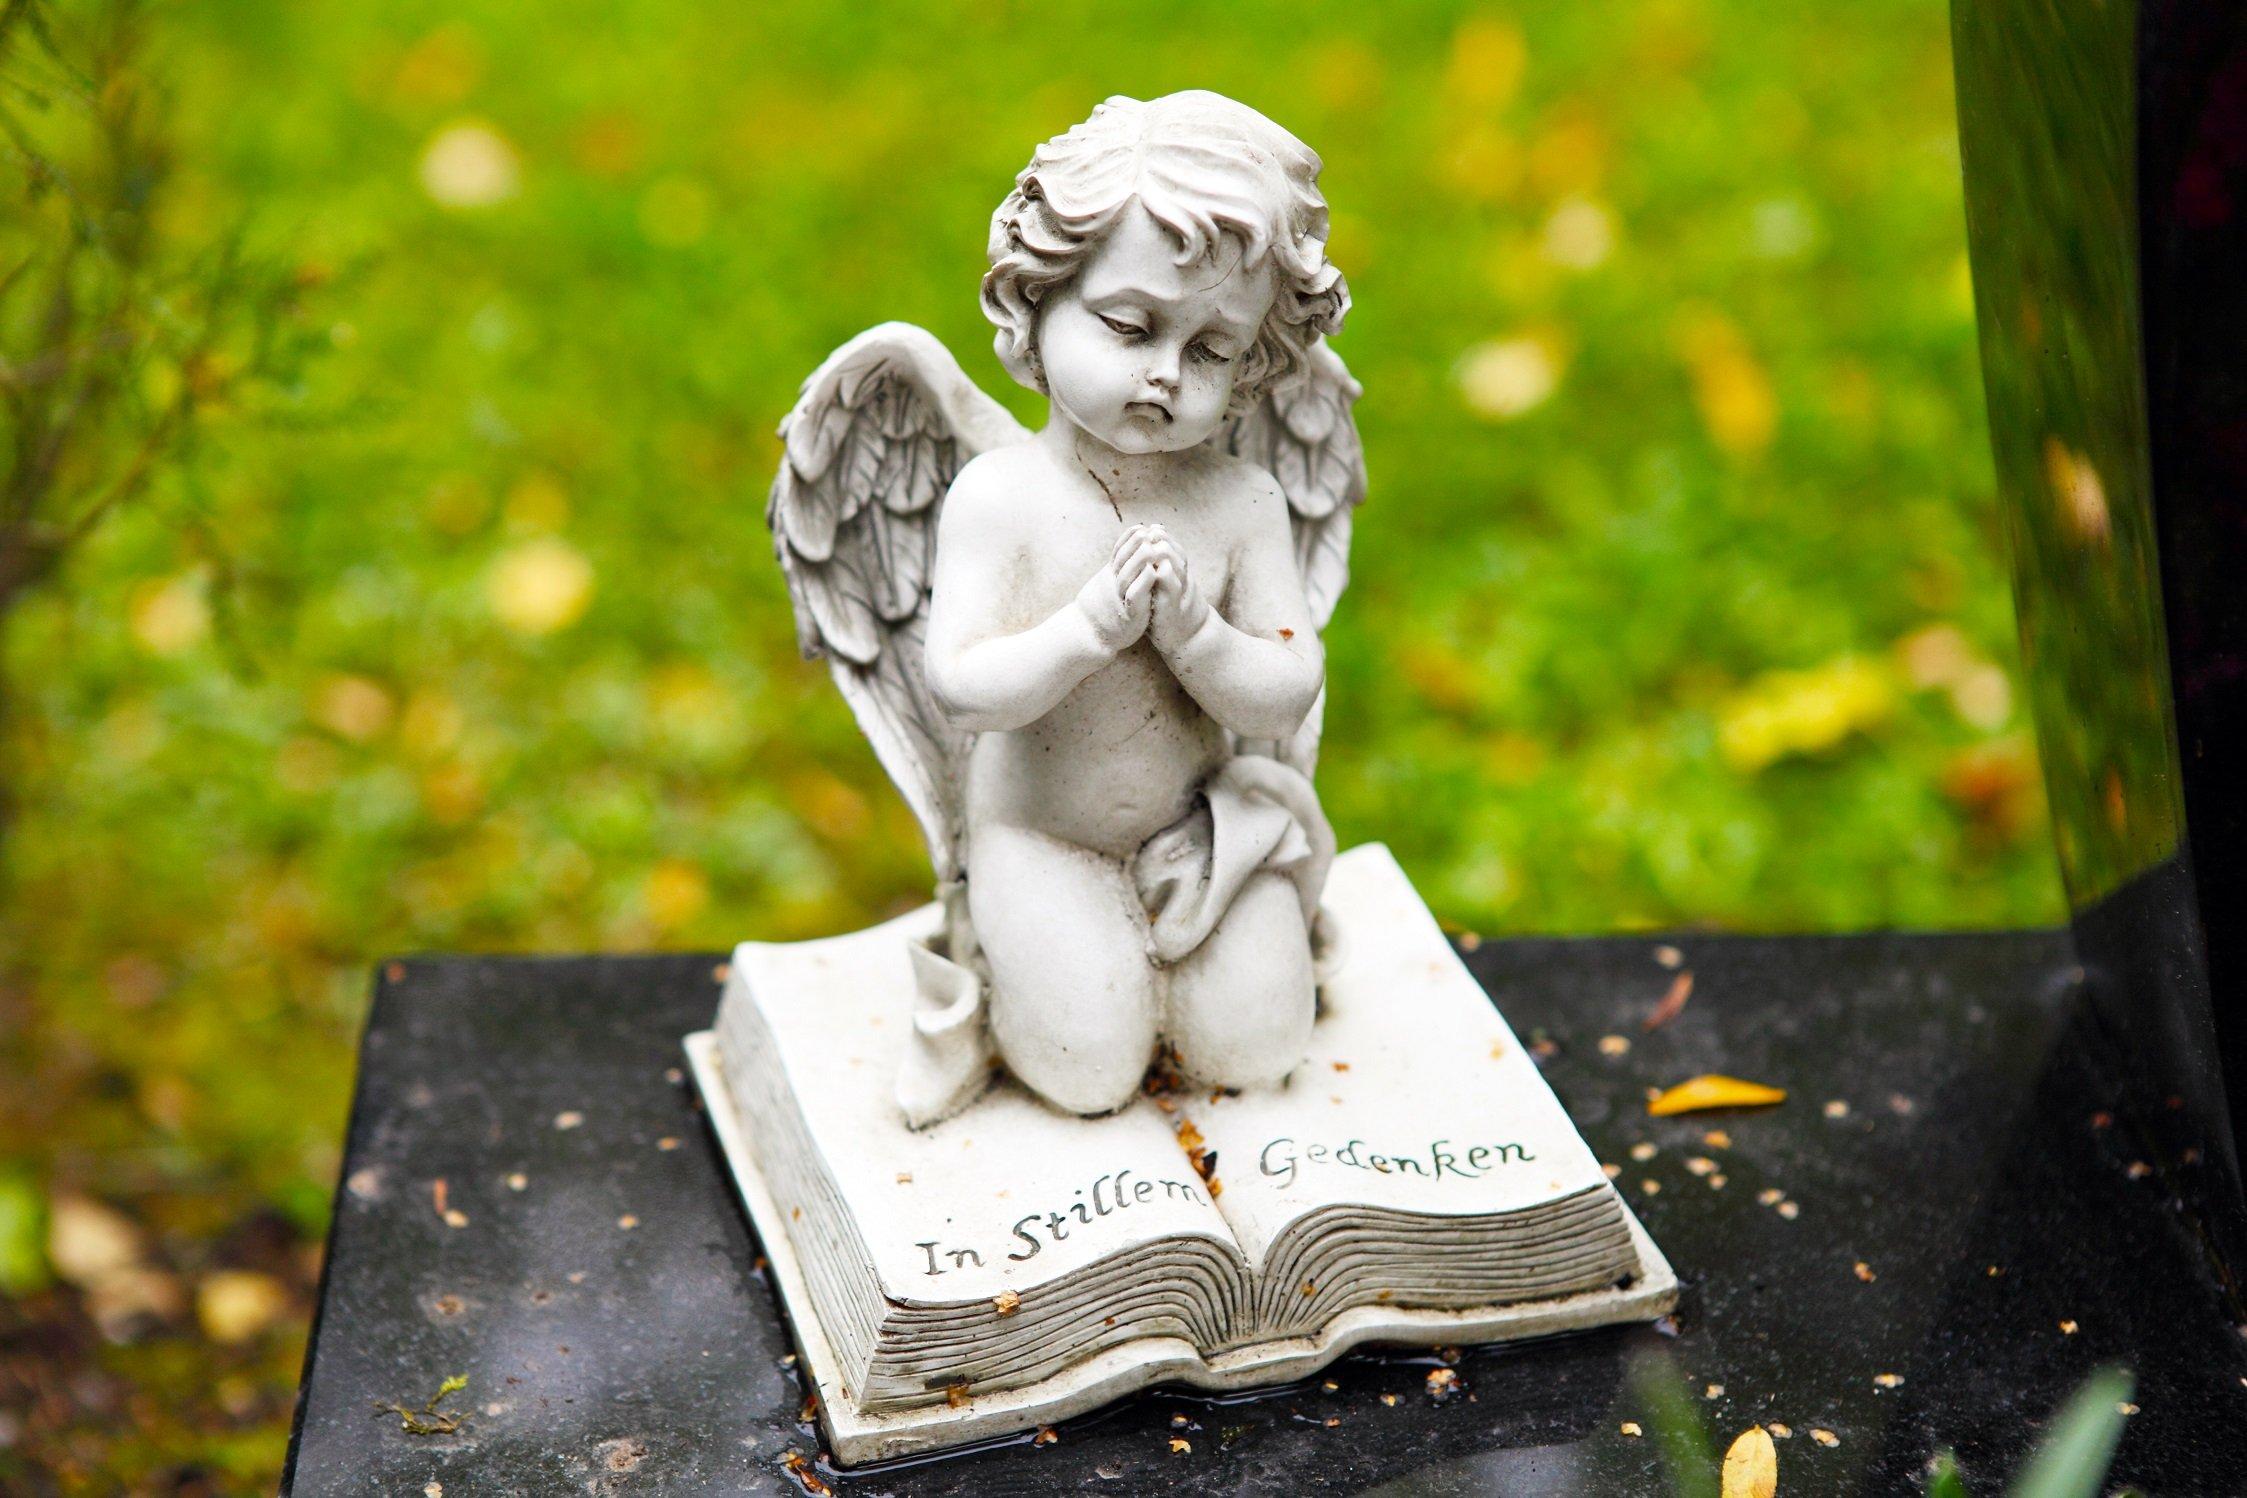 Querubín en cementerio || Fuente: Shutterstock